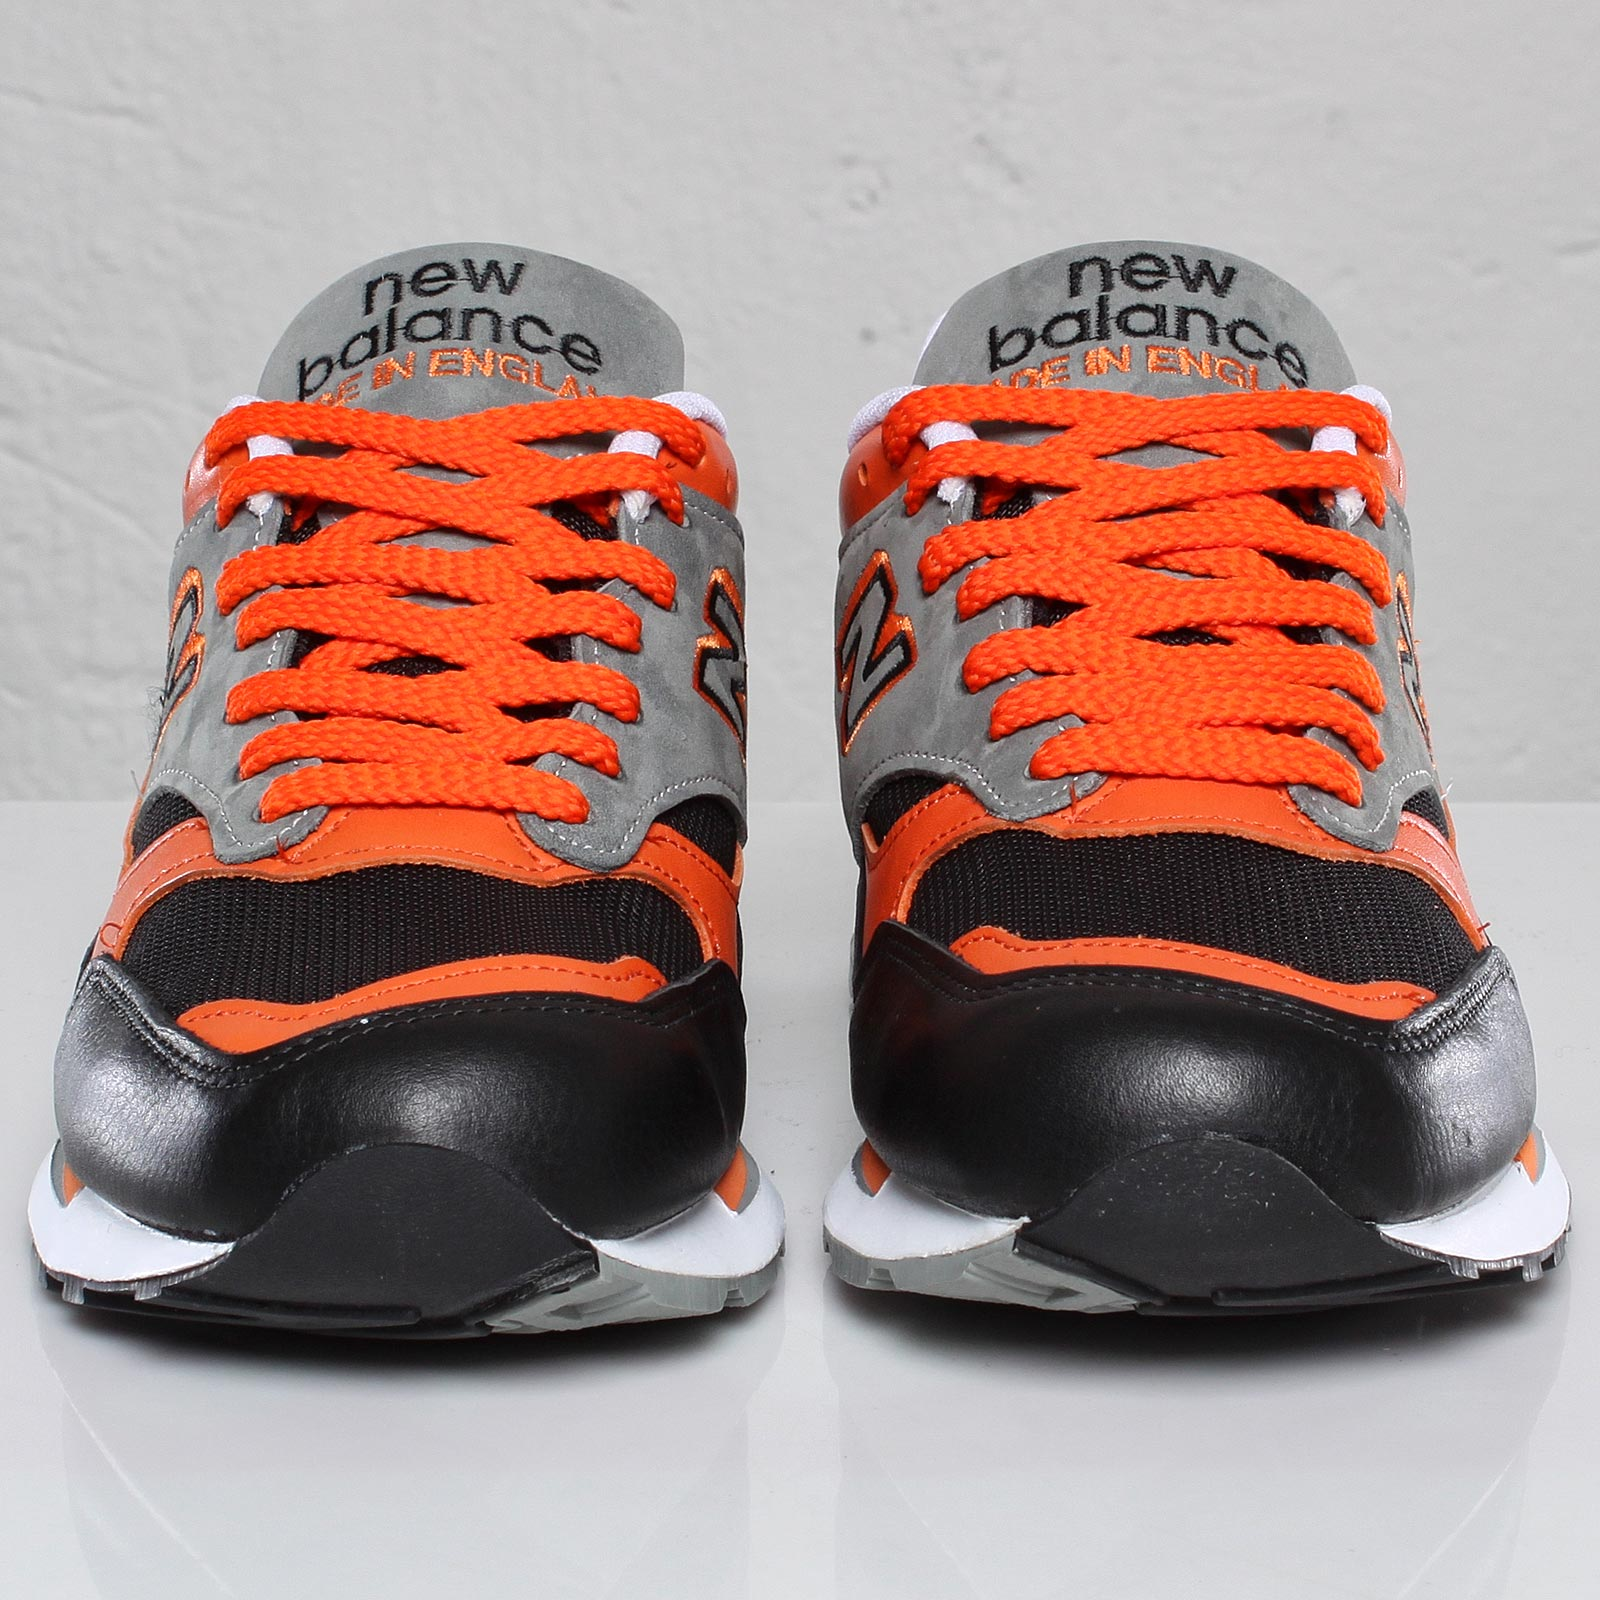 New Balance M1500 - 102540 - Sneakersnstuff | sneakers ...